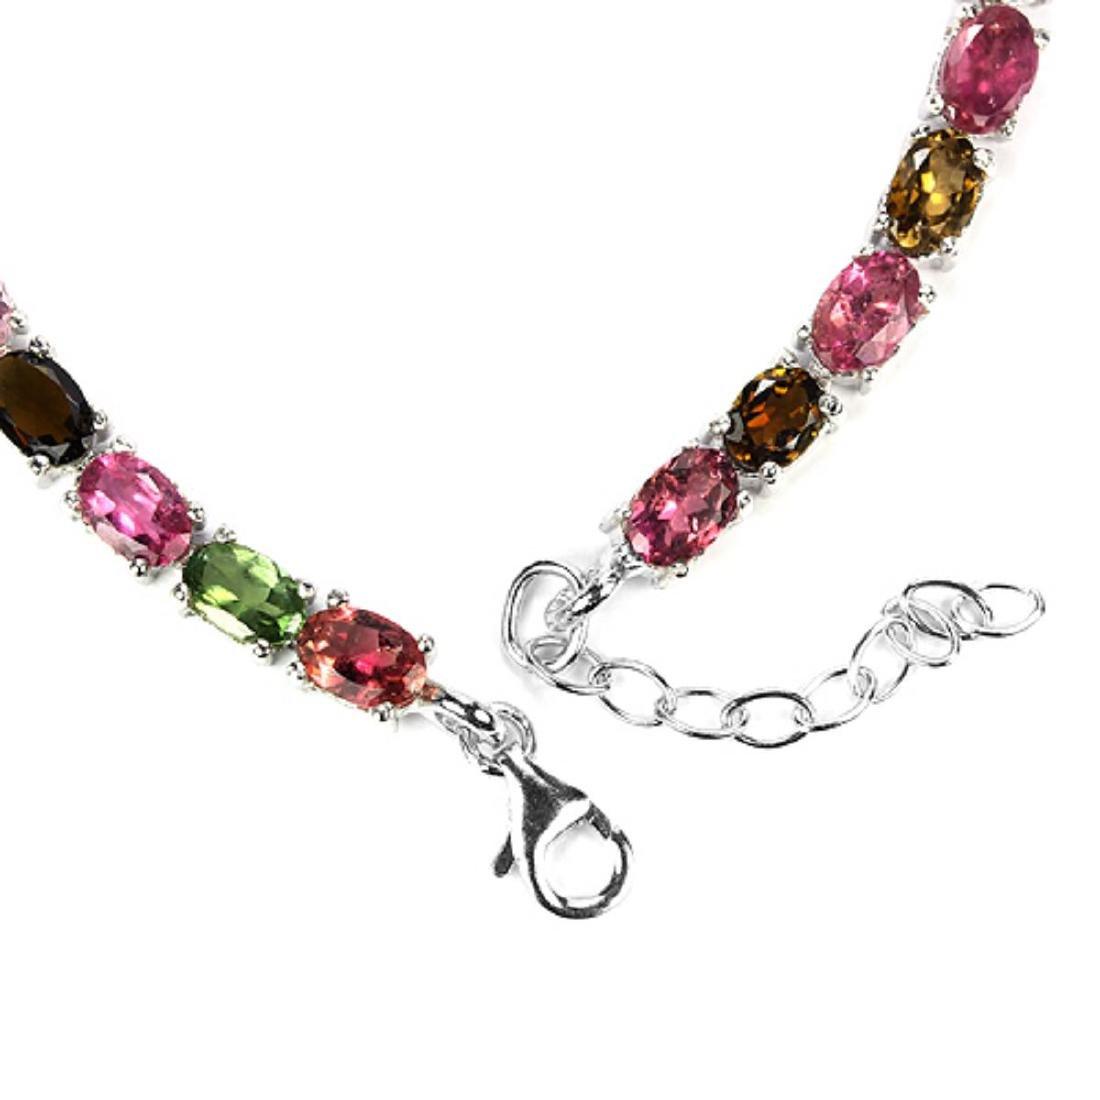 Natural Fancy Color Tourmaline Bracelet - 3